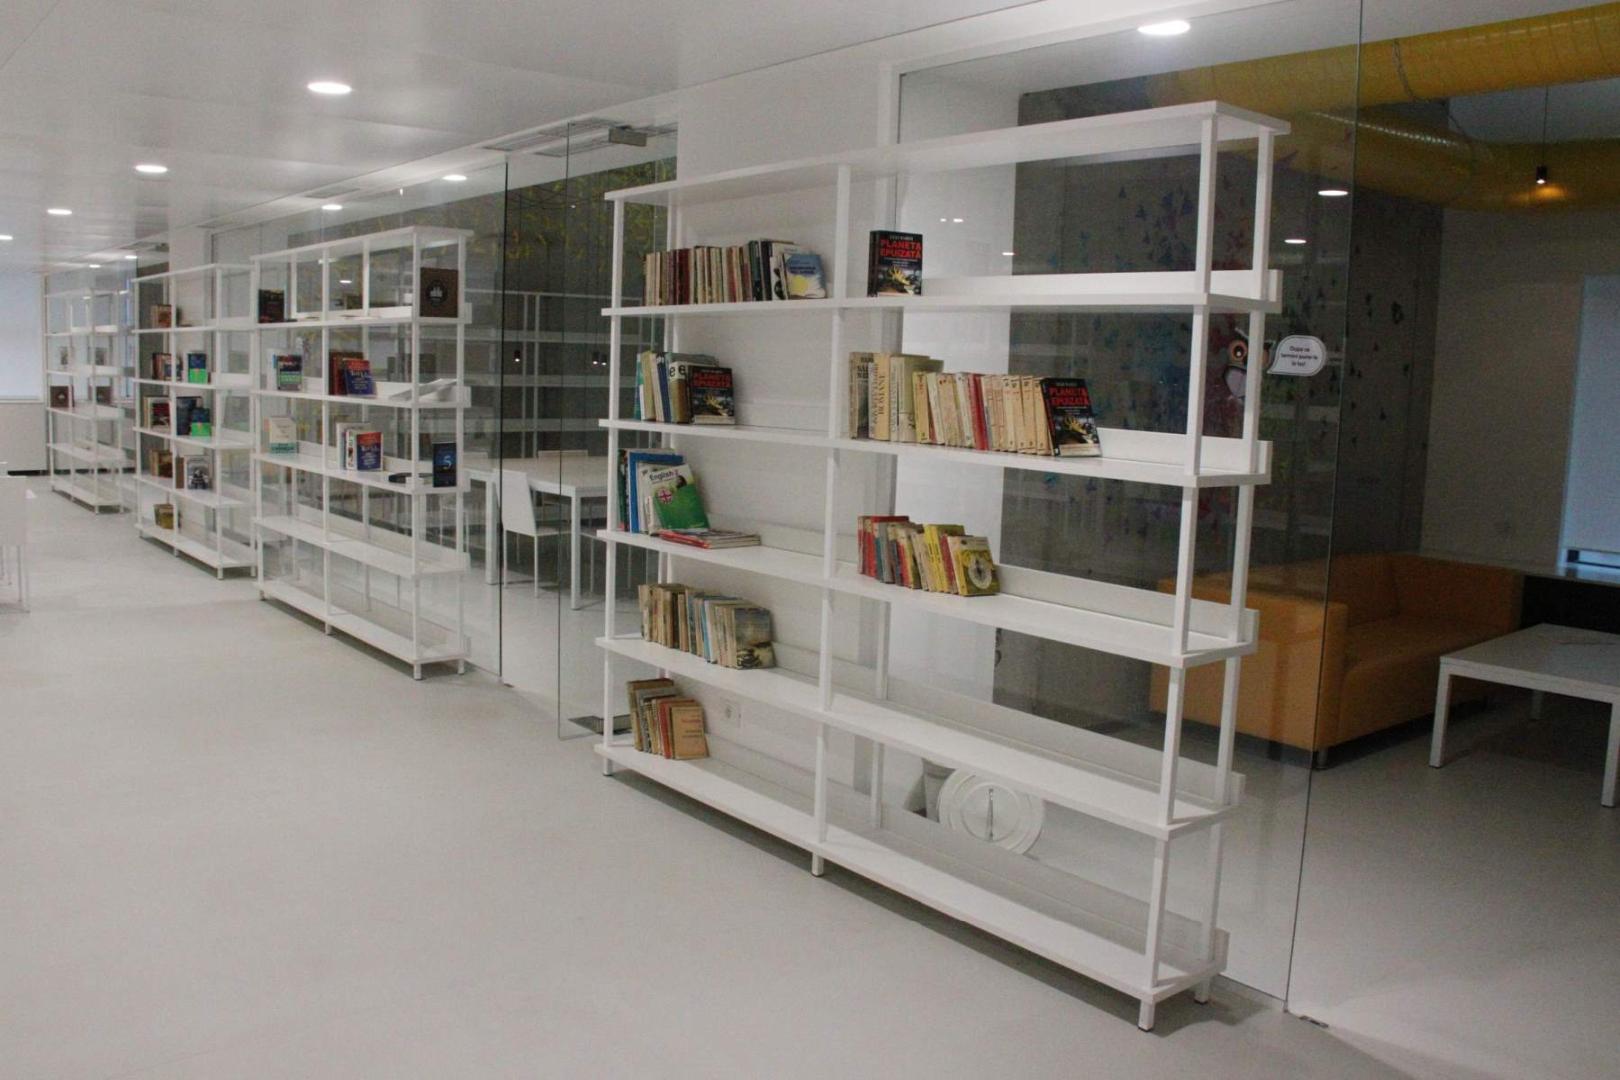 biblioteca west gate mobilier rafturi mese scaune placari grupuri sanitare006